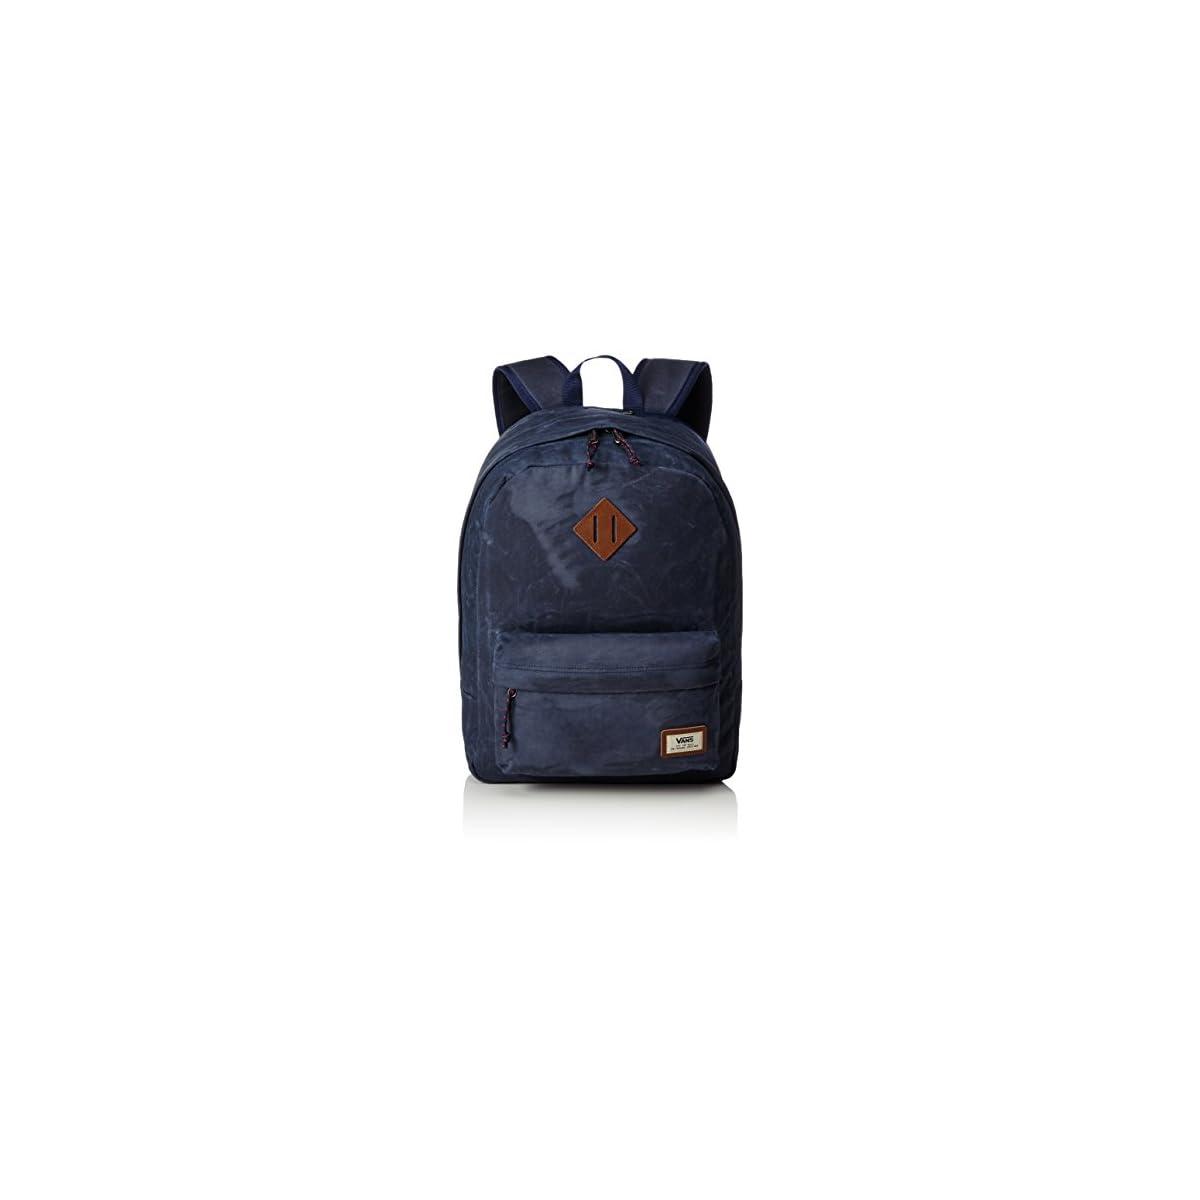 41onrYyOCtL. SS1200  - Vans Old Skool Plus Backpack Mochila, 44cm, 23L, Dress blaus Heather